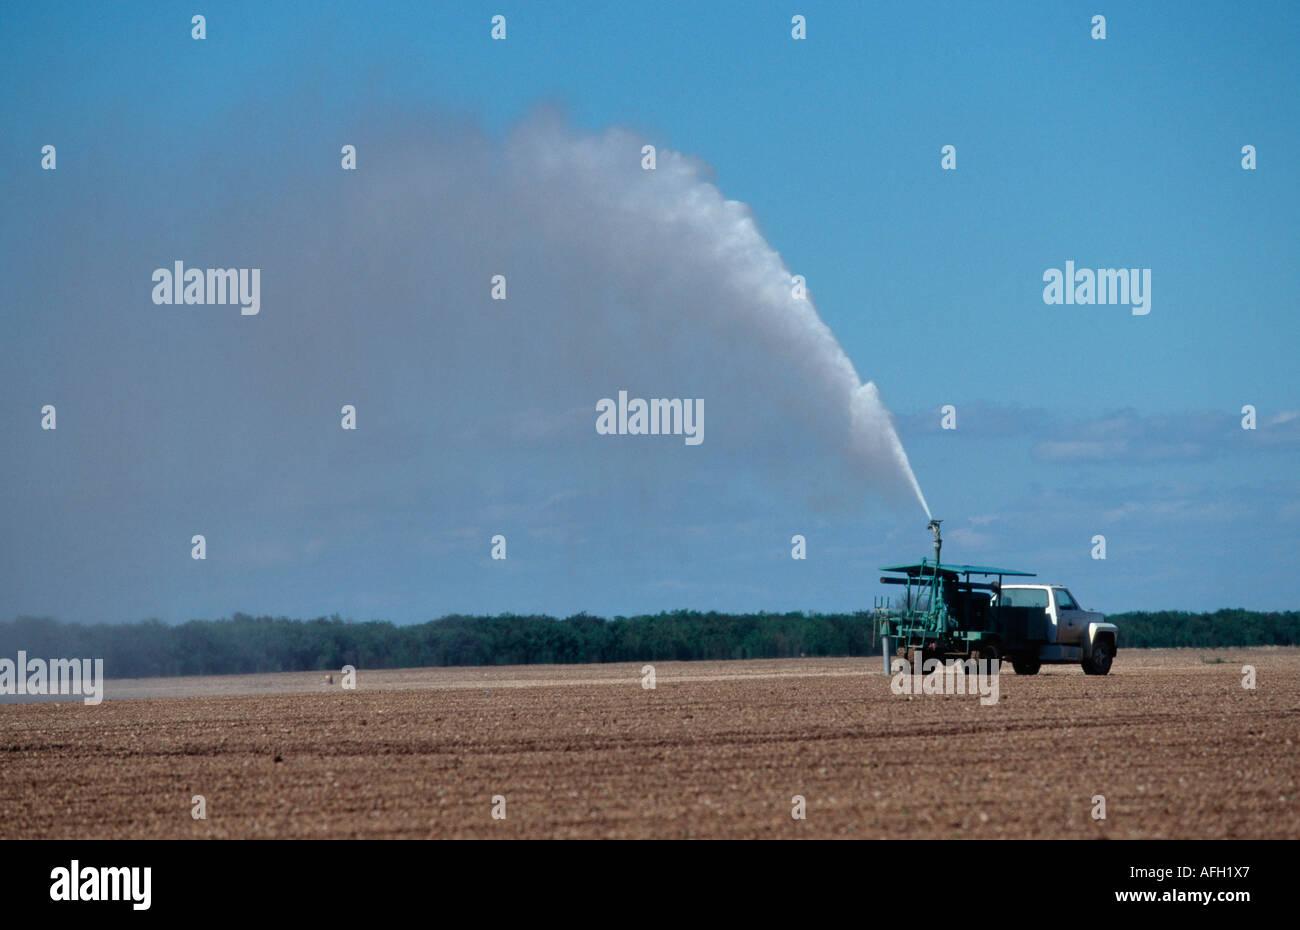 Pumper Truck plying fields, Everglades, Florida, USA - Stock Image